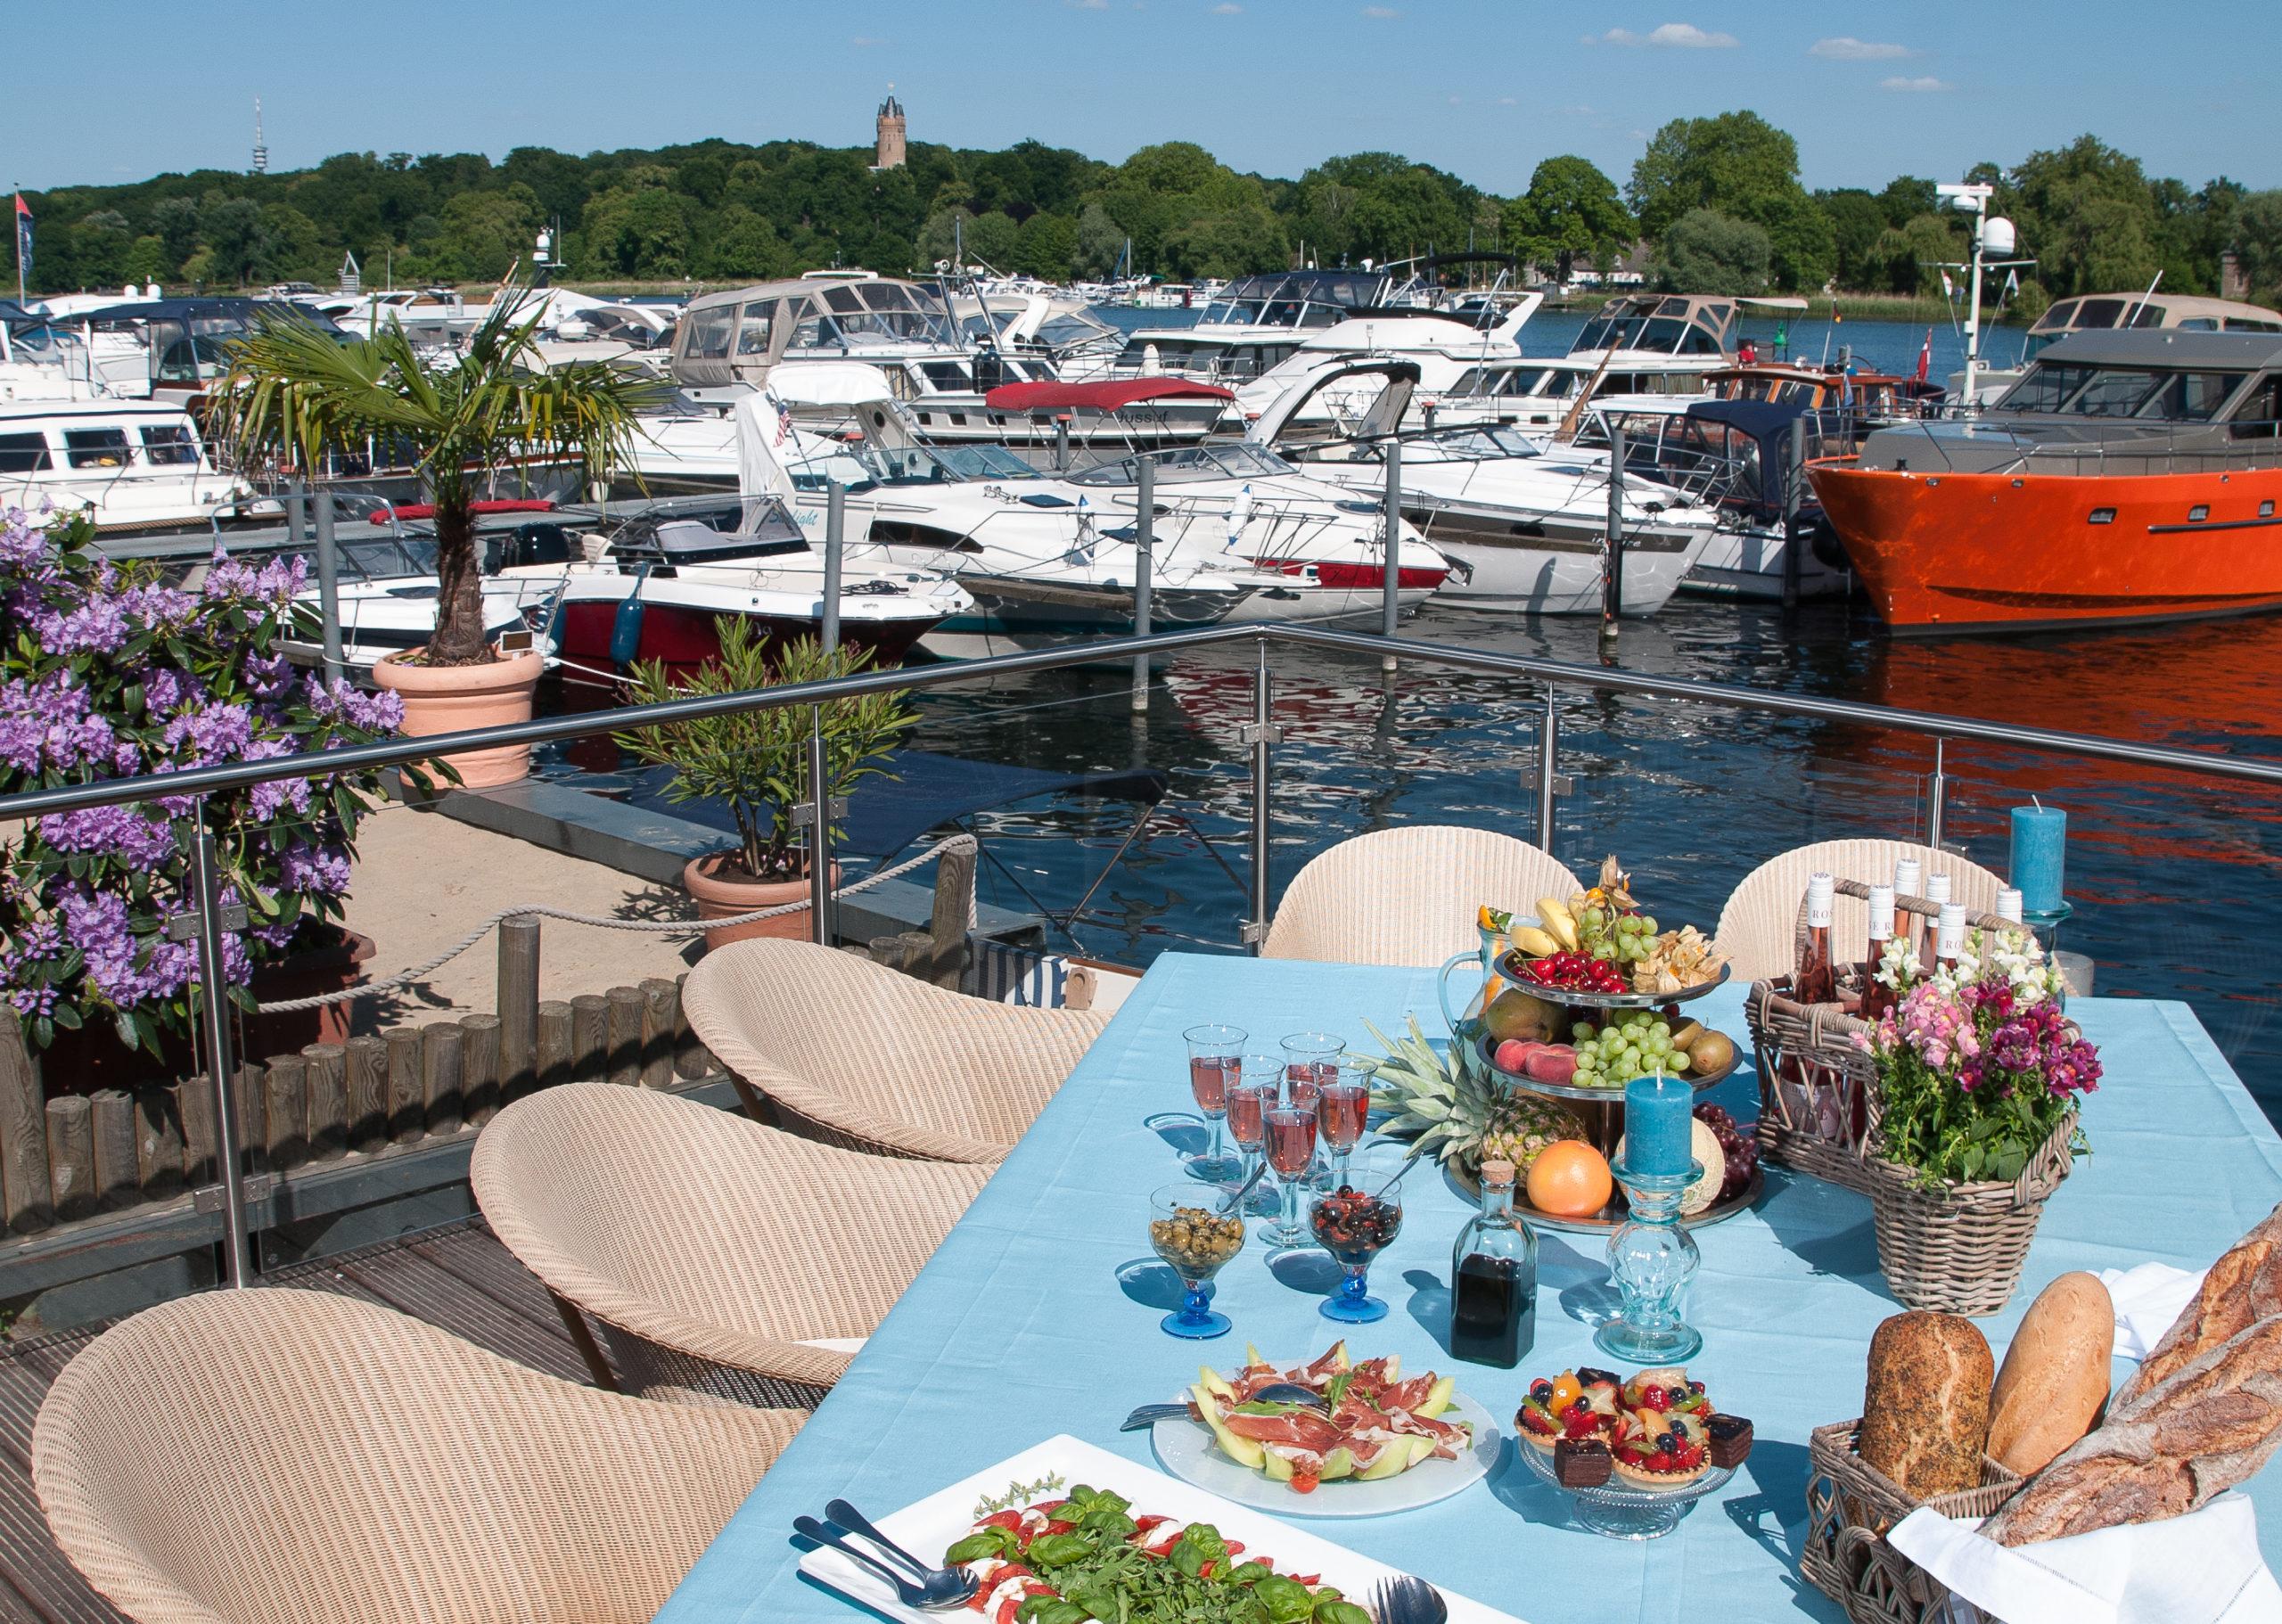 Restaurant Marina am Tiefen See in Potsdam